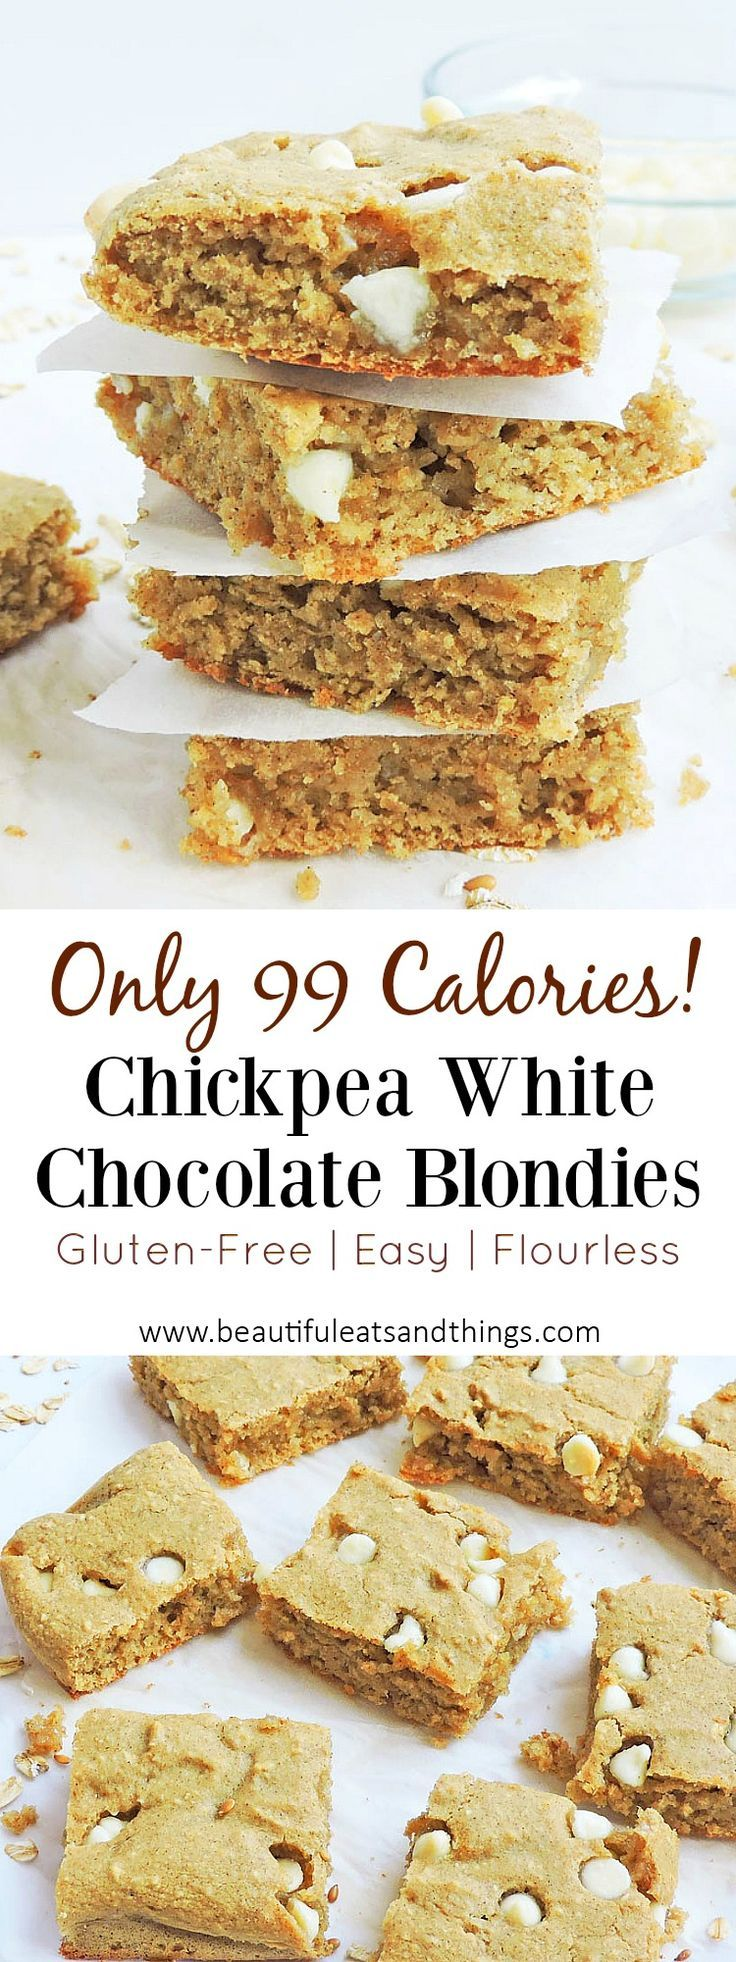 Flourless Chickpea White Chocolate Blondies - -